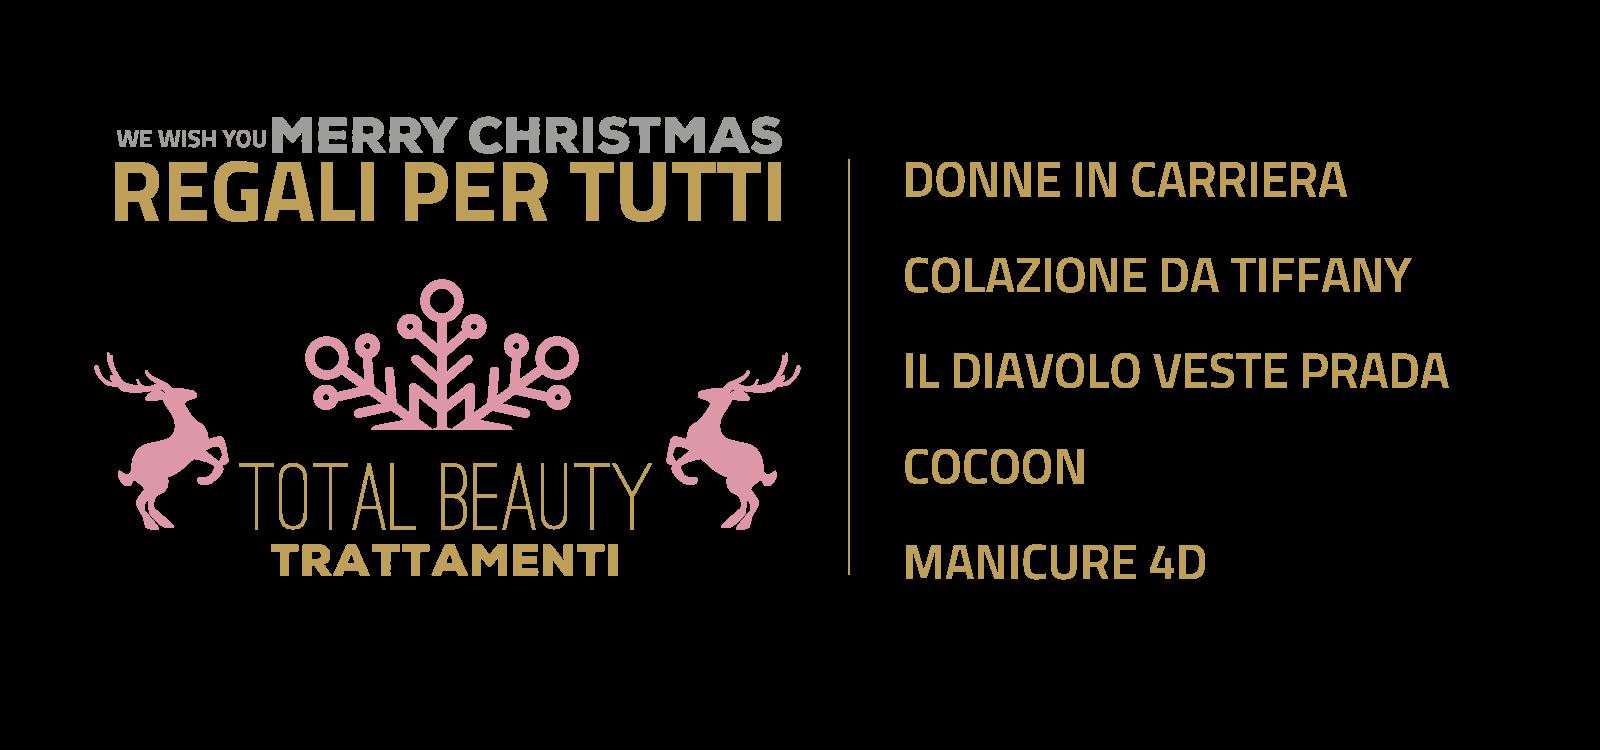 1_slide-show-regali-Natale-2018